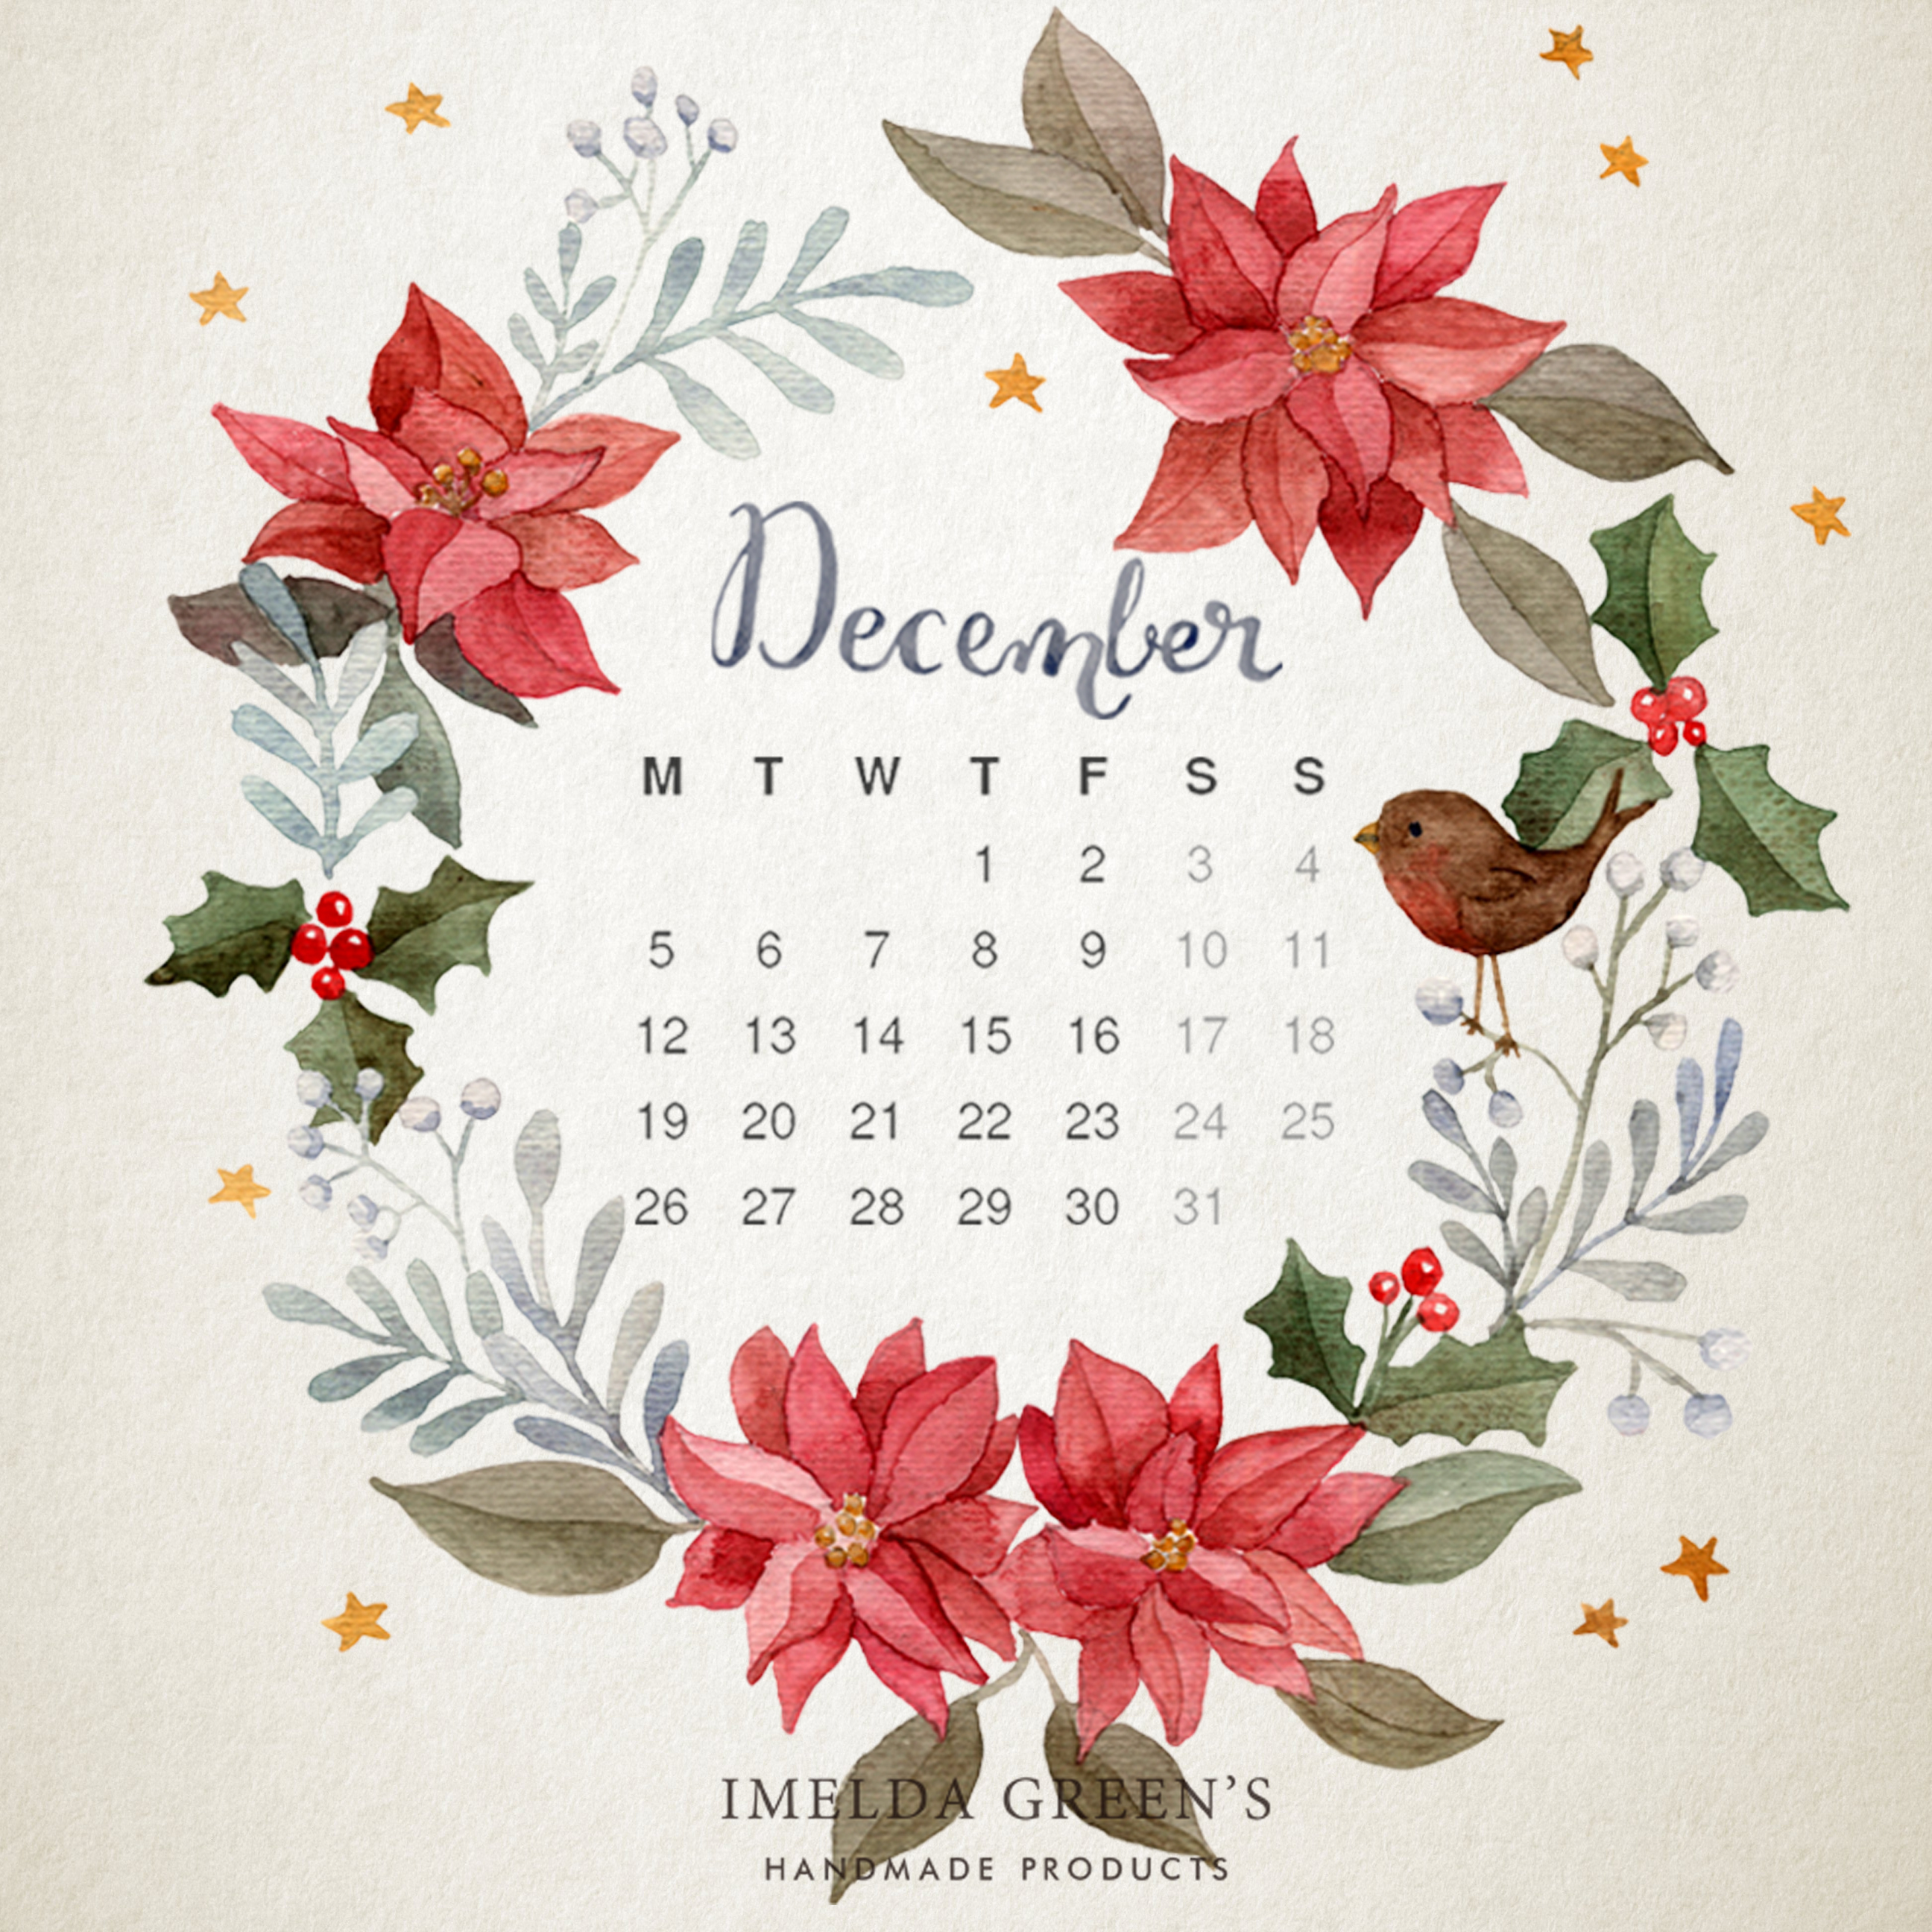 16_12_december_imeldamade_instagram